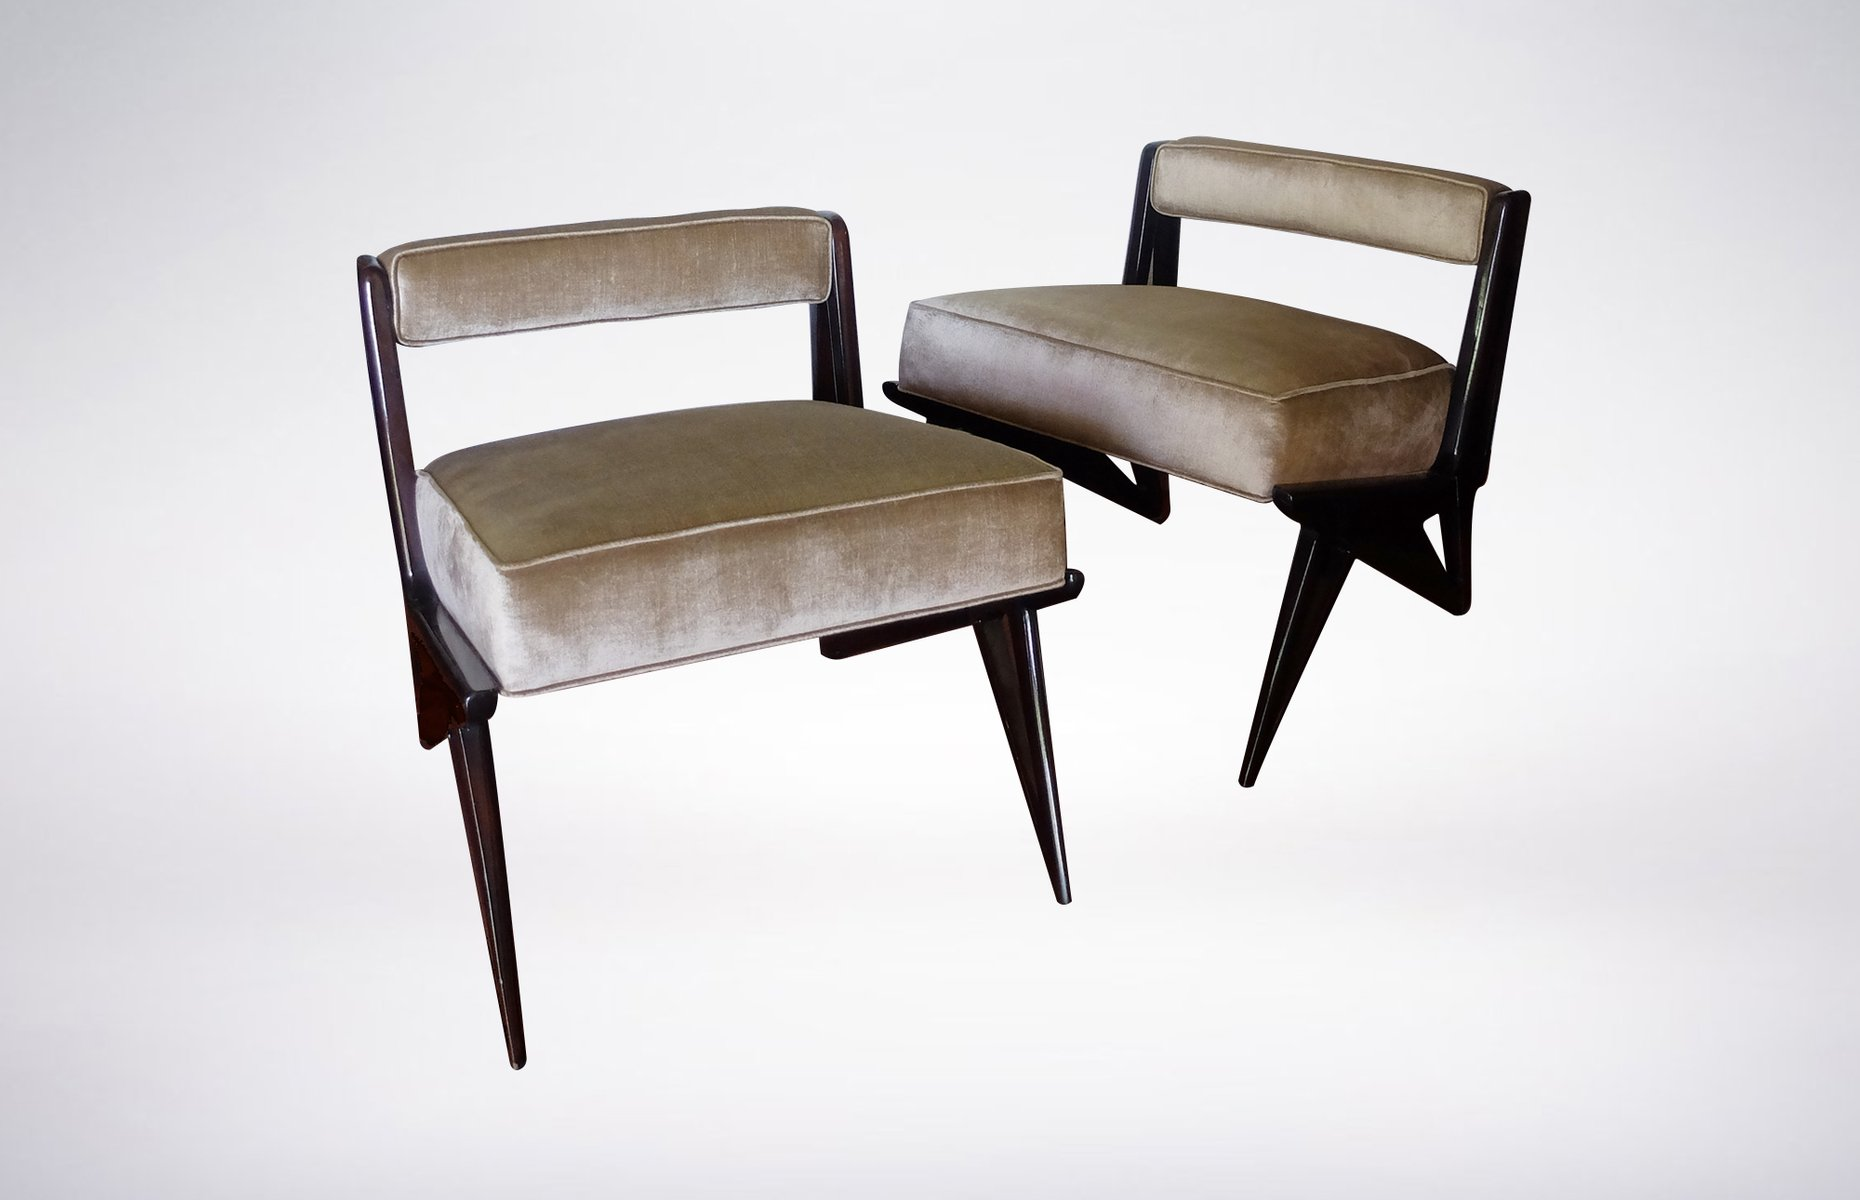 Grau gr ner samt polsterstuhl 1950er bei pamono kaufen for Polsterstuhl grau